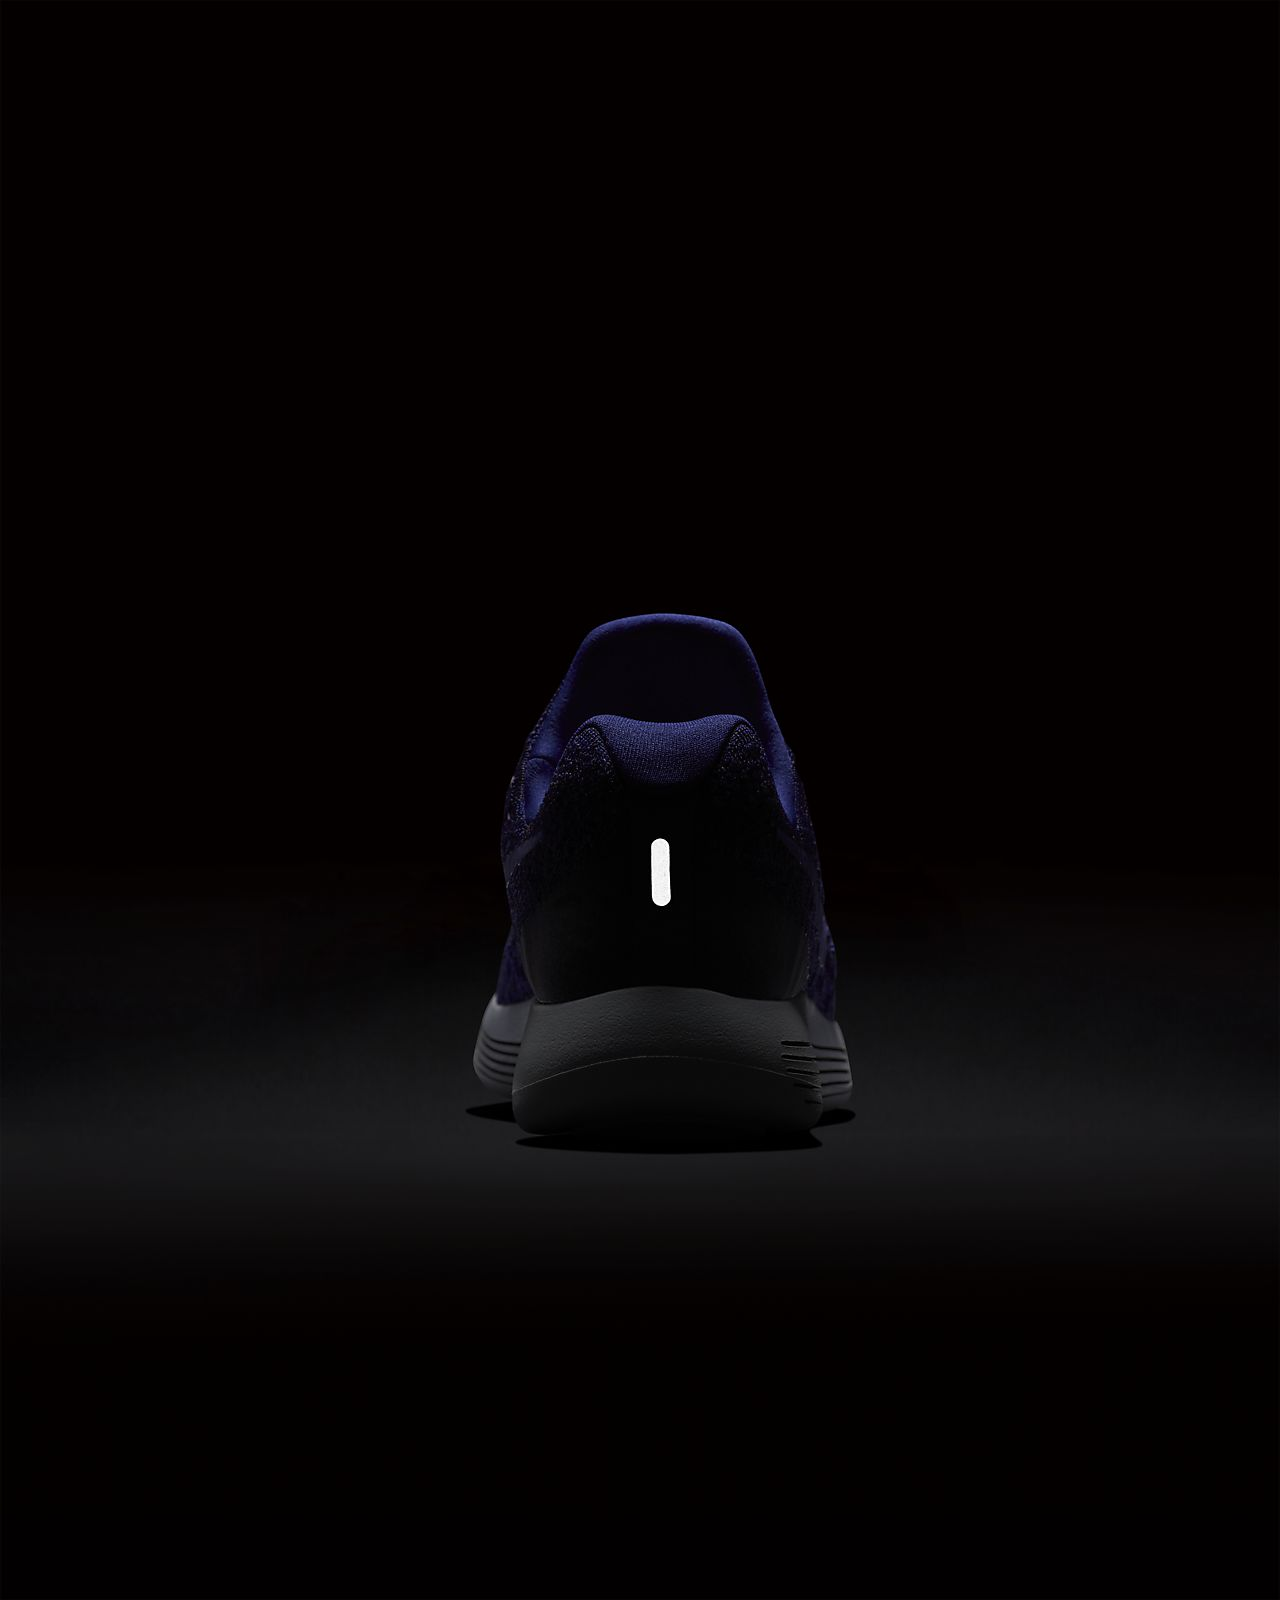 quality design 51258 64d9e Nike LunarEpic Low Flyknit 2 Women's Running Shoe